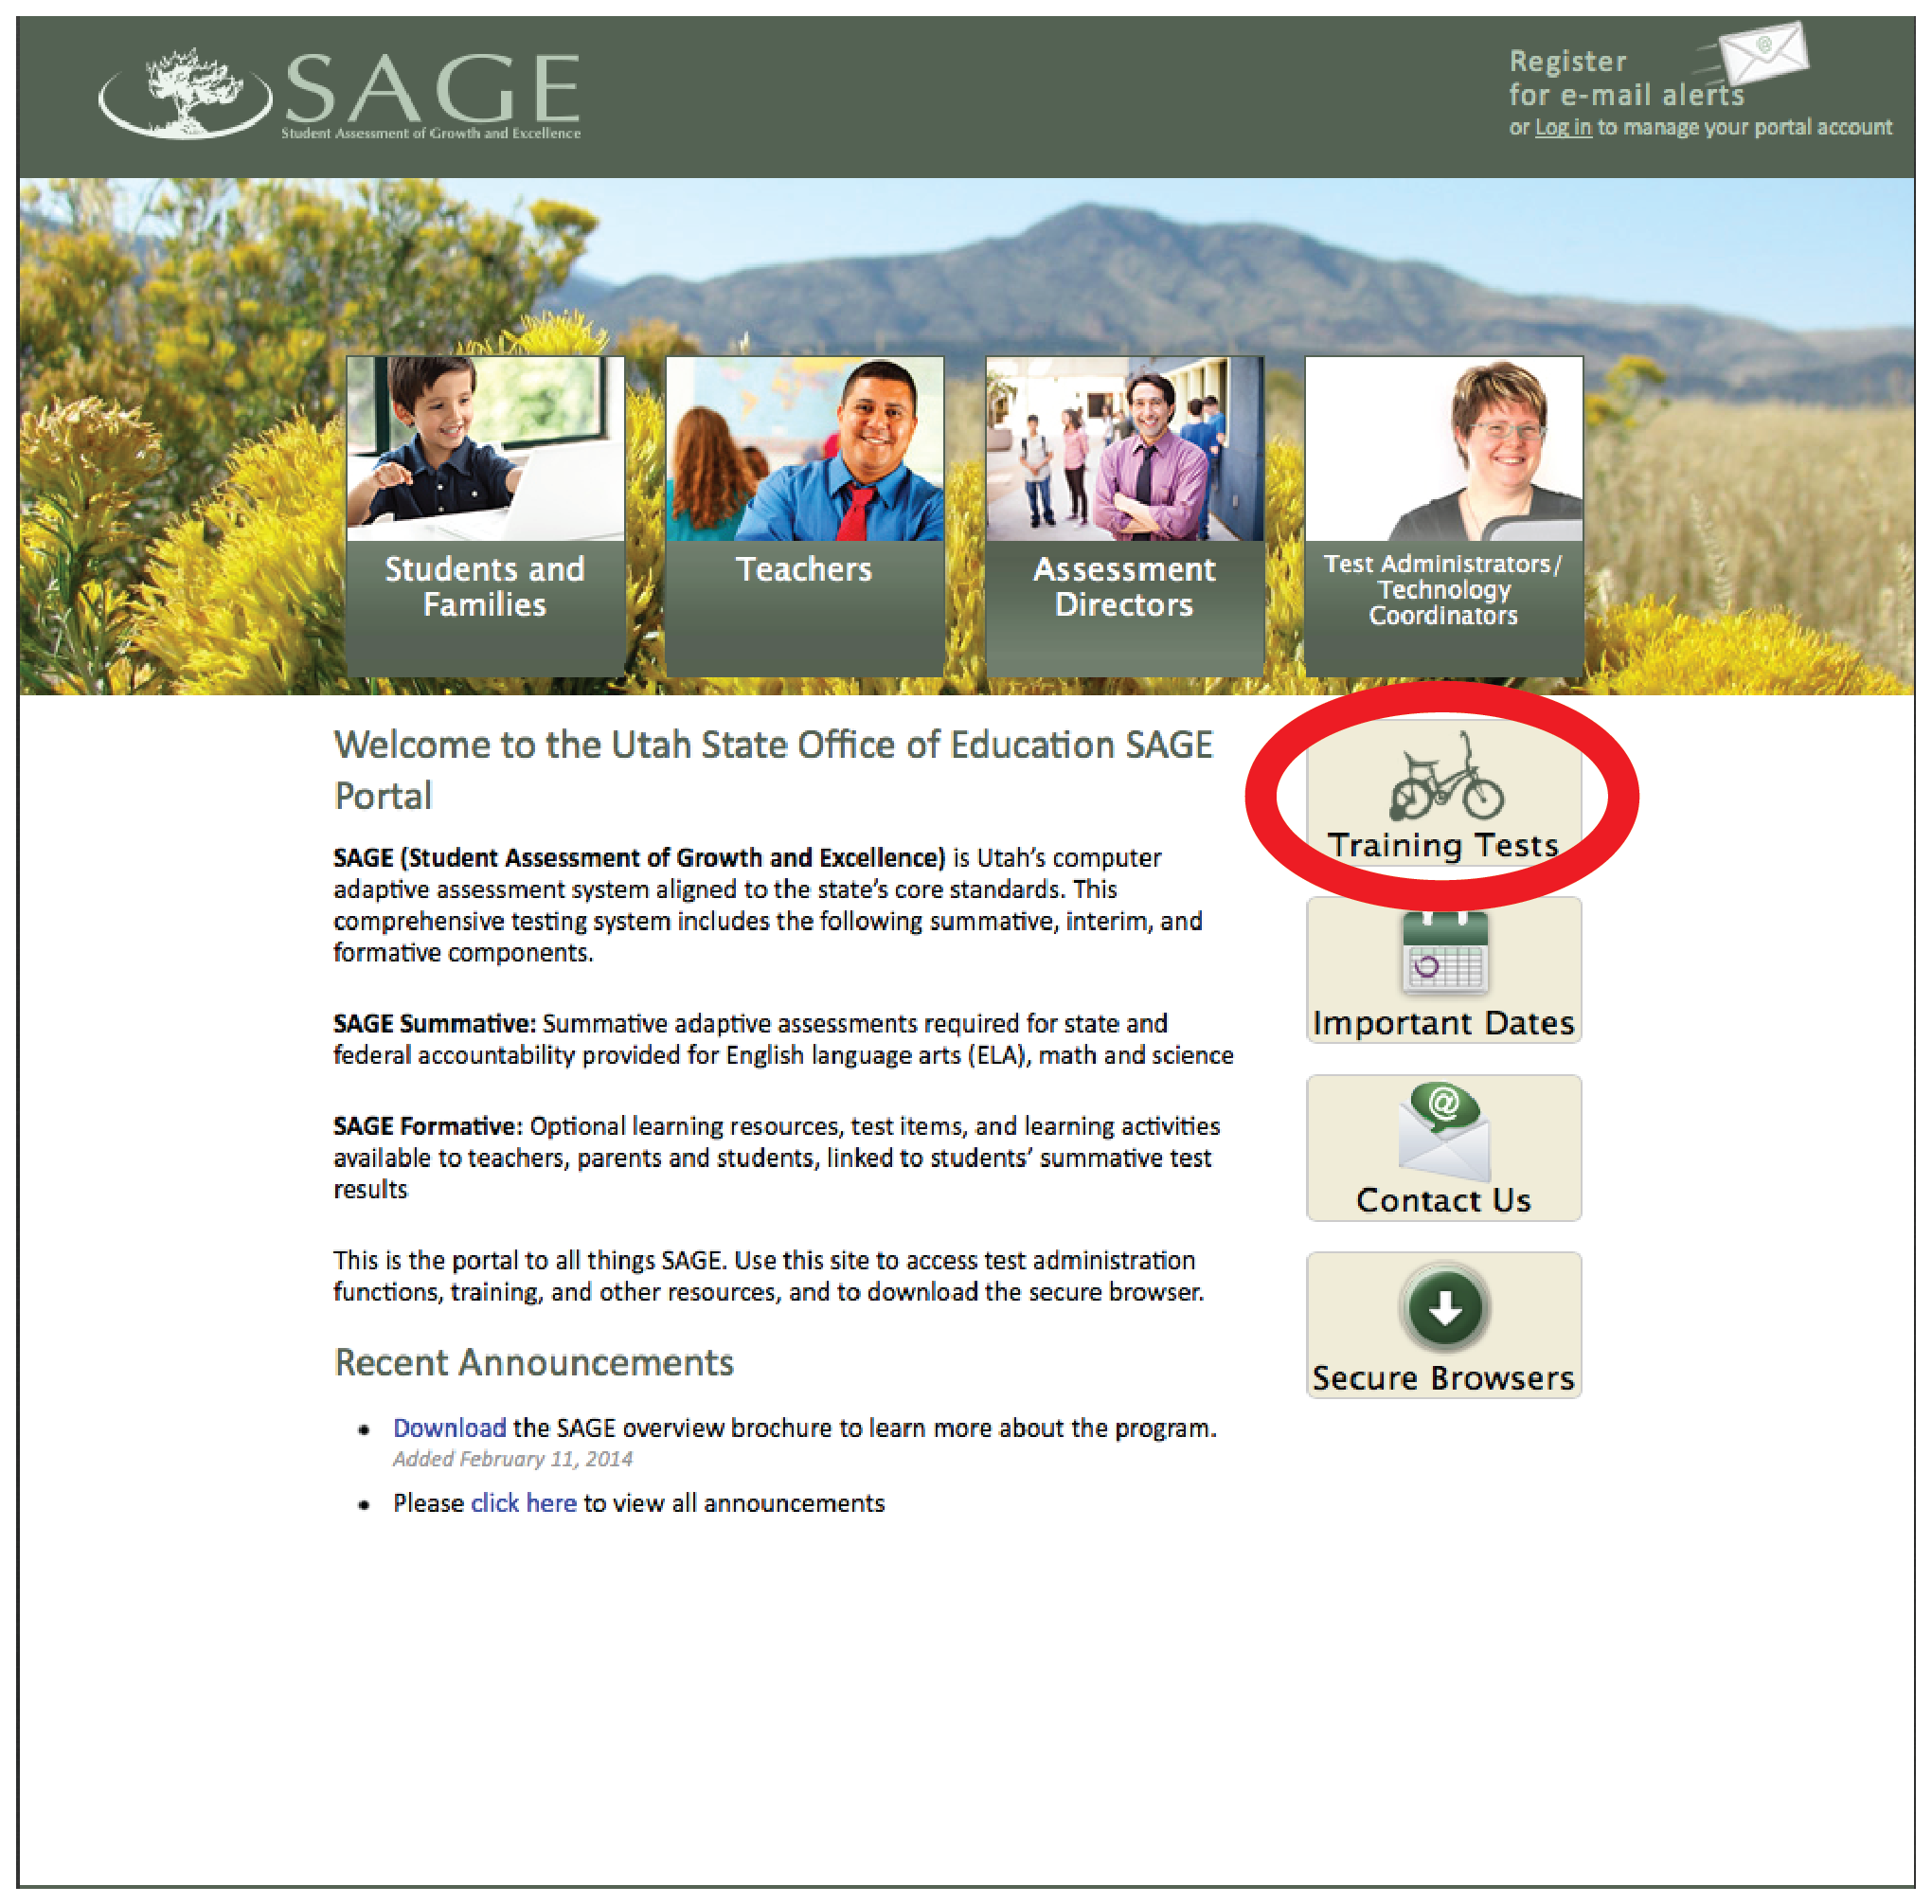 SAGE: Utah's new end-of-year test